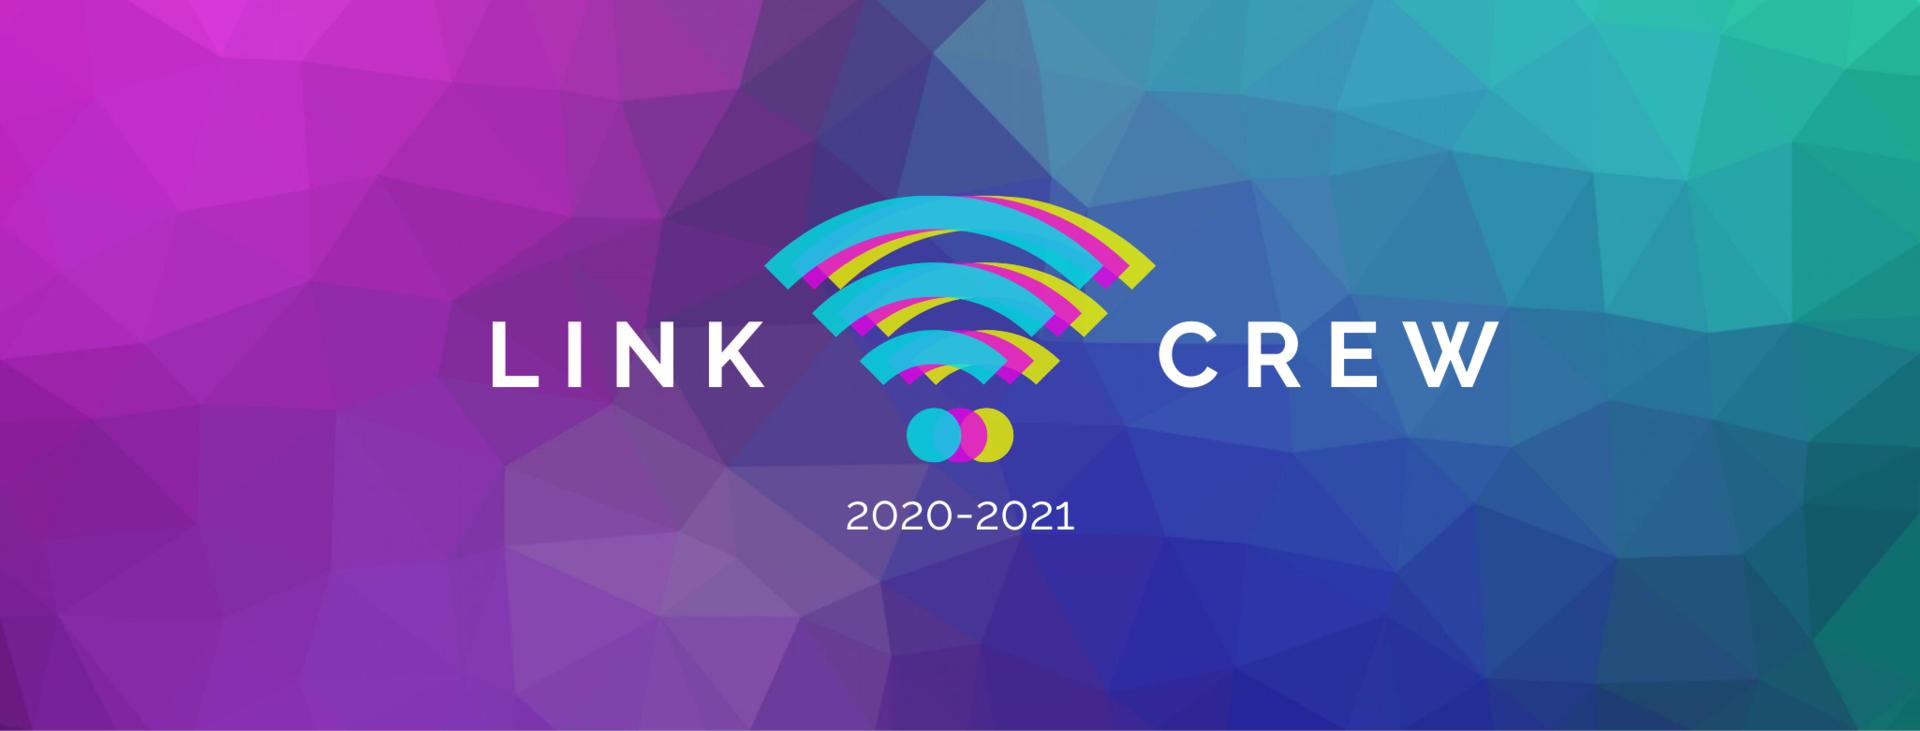 Link Crew 2020 Cover Photo